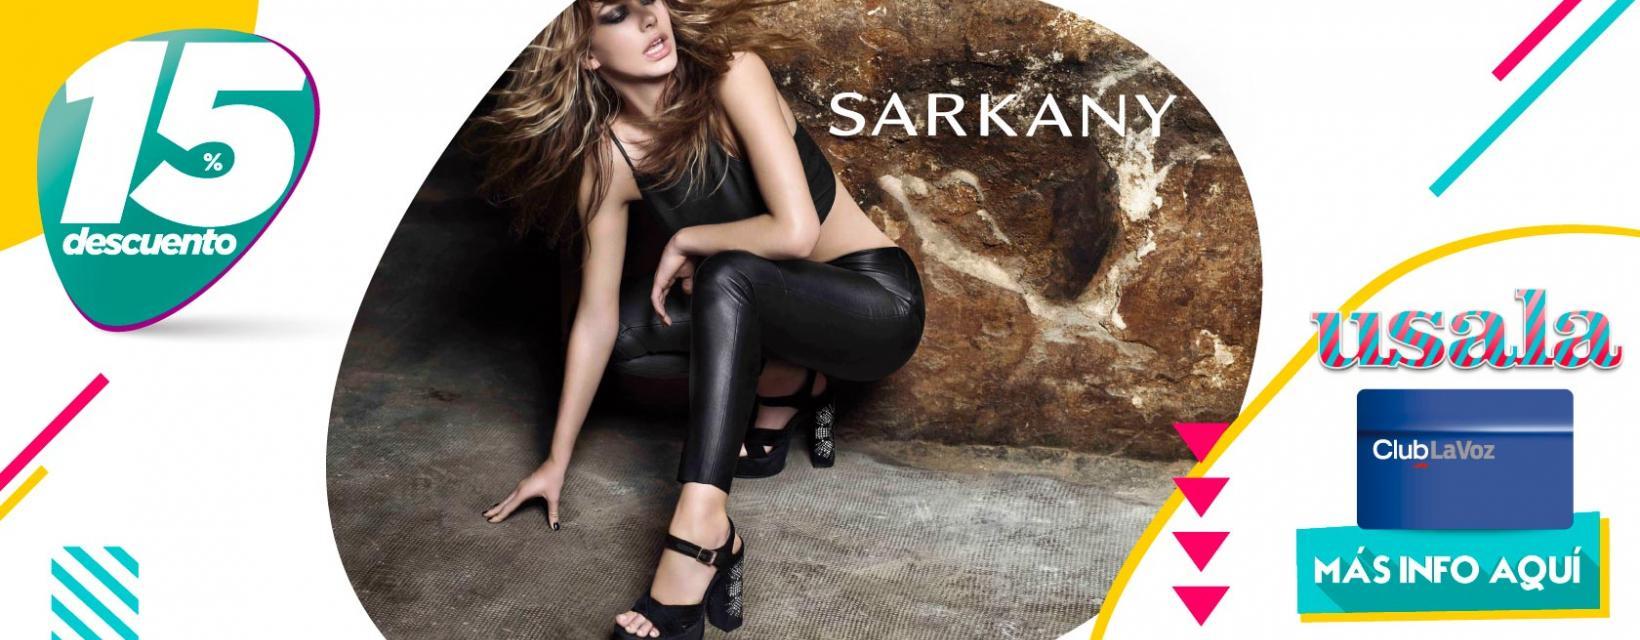 Sarkany BANNER